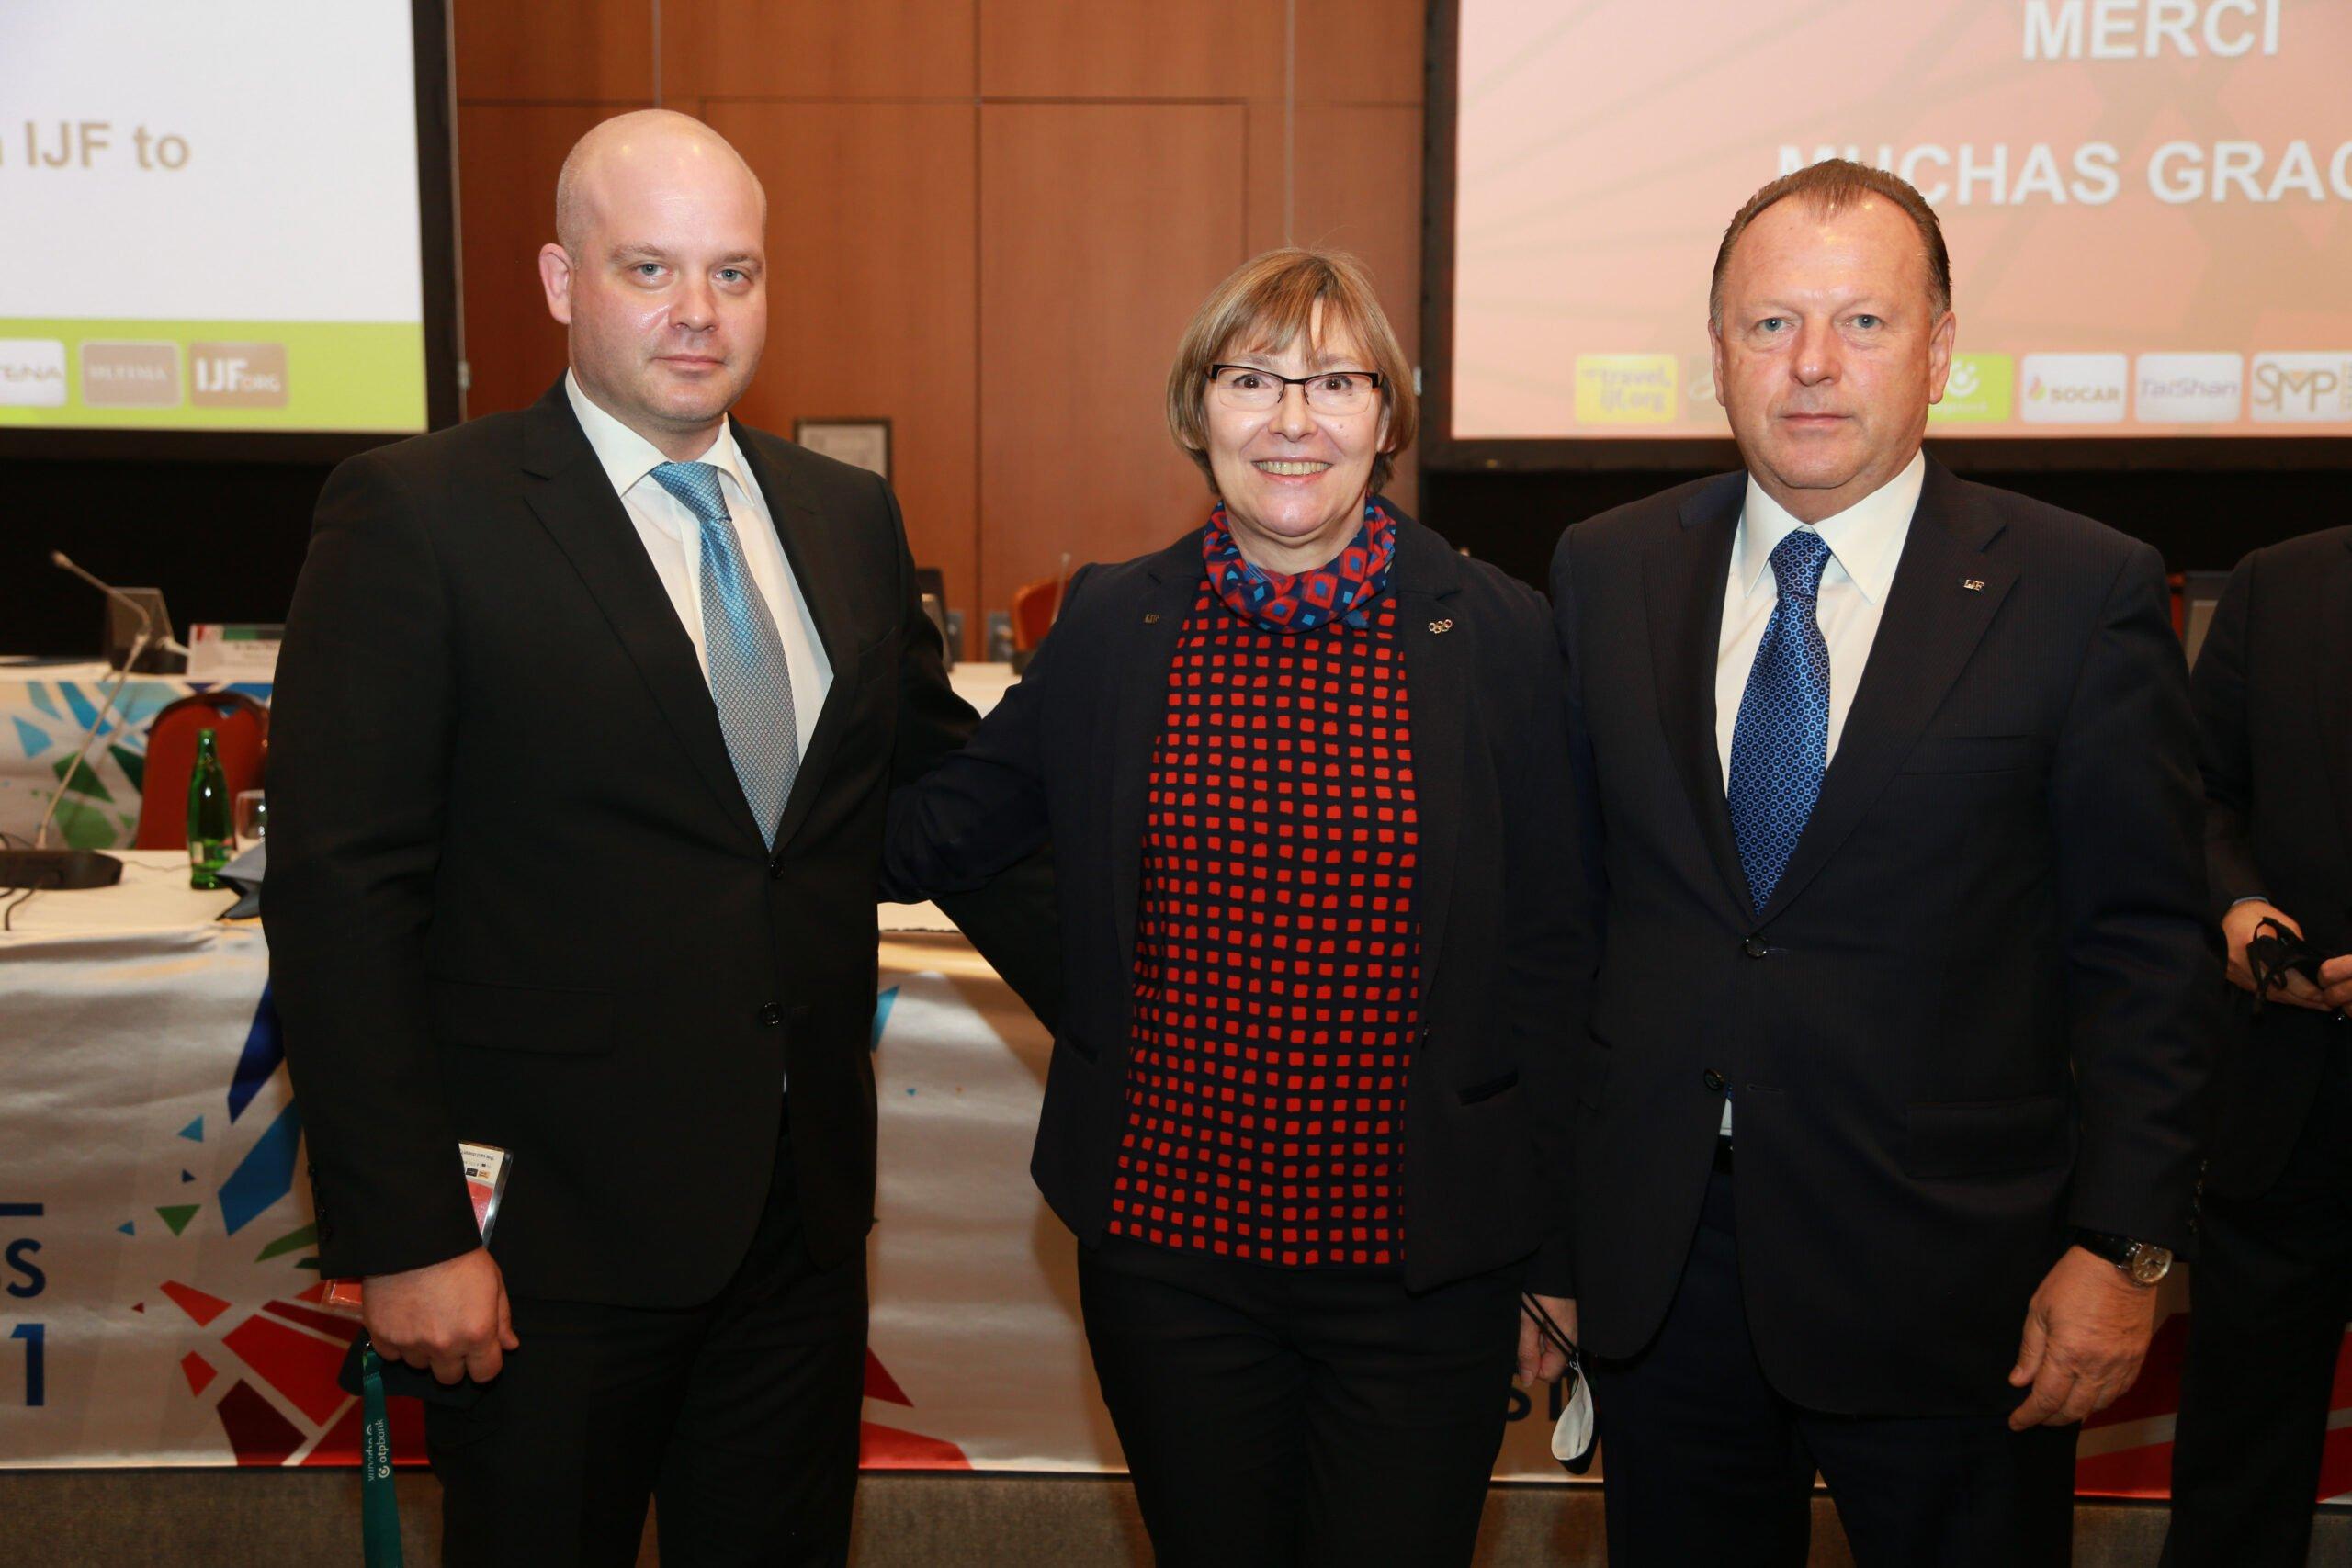 New IJF Education Director Sanda Corak (CRO) with Marius Vizer and EJU Sport Director Hrvoje Lindi